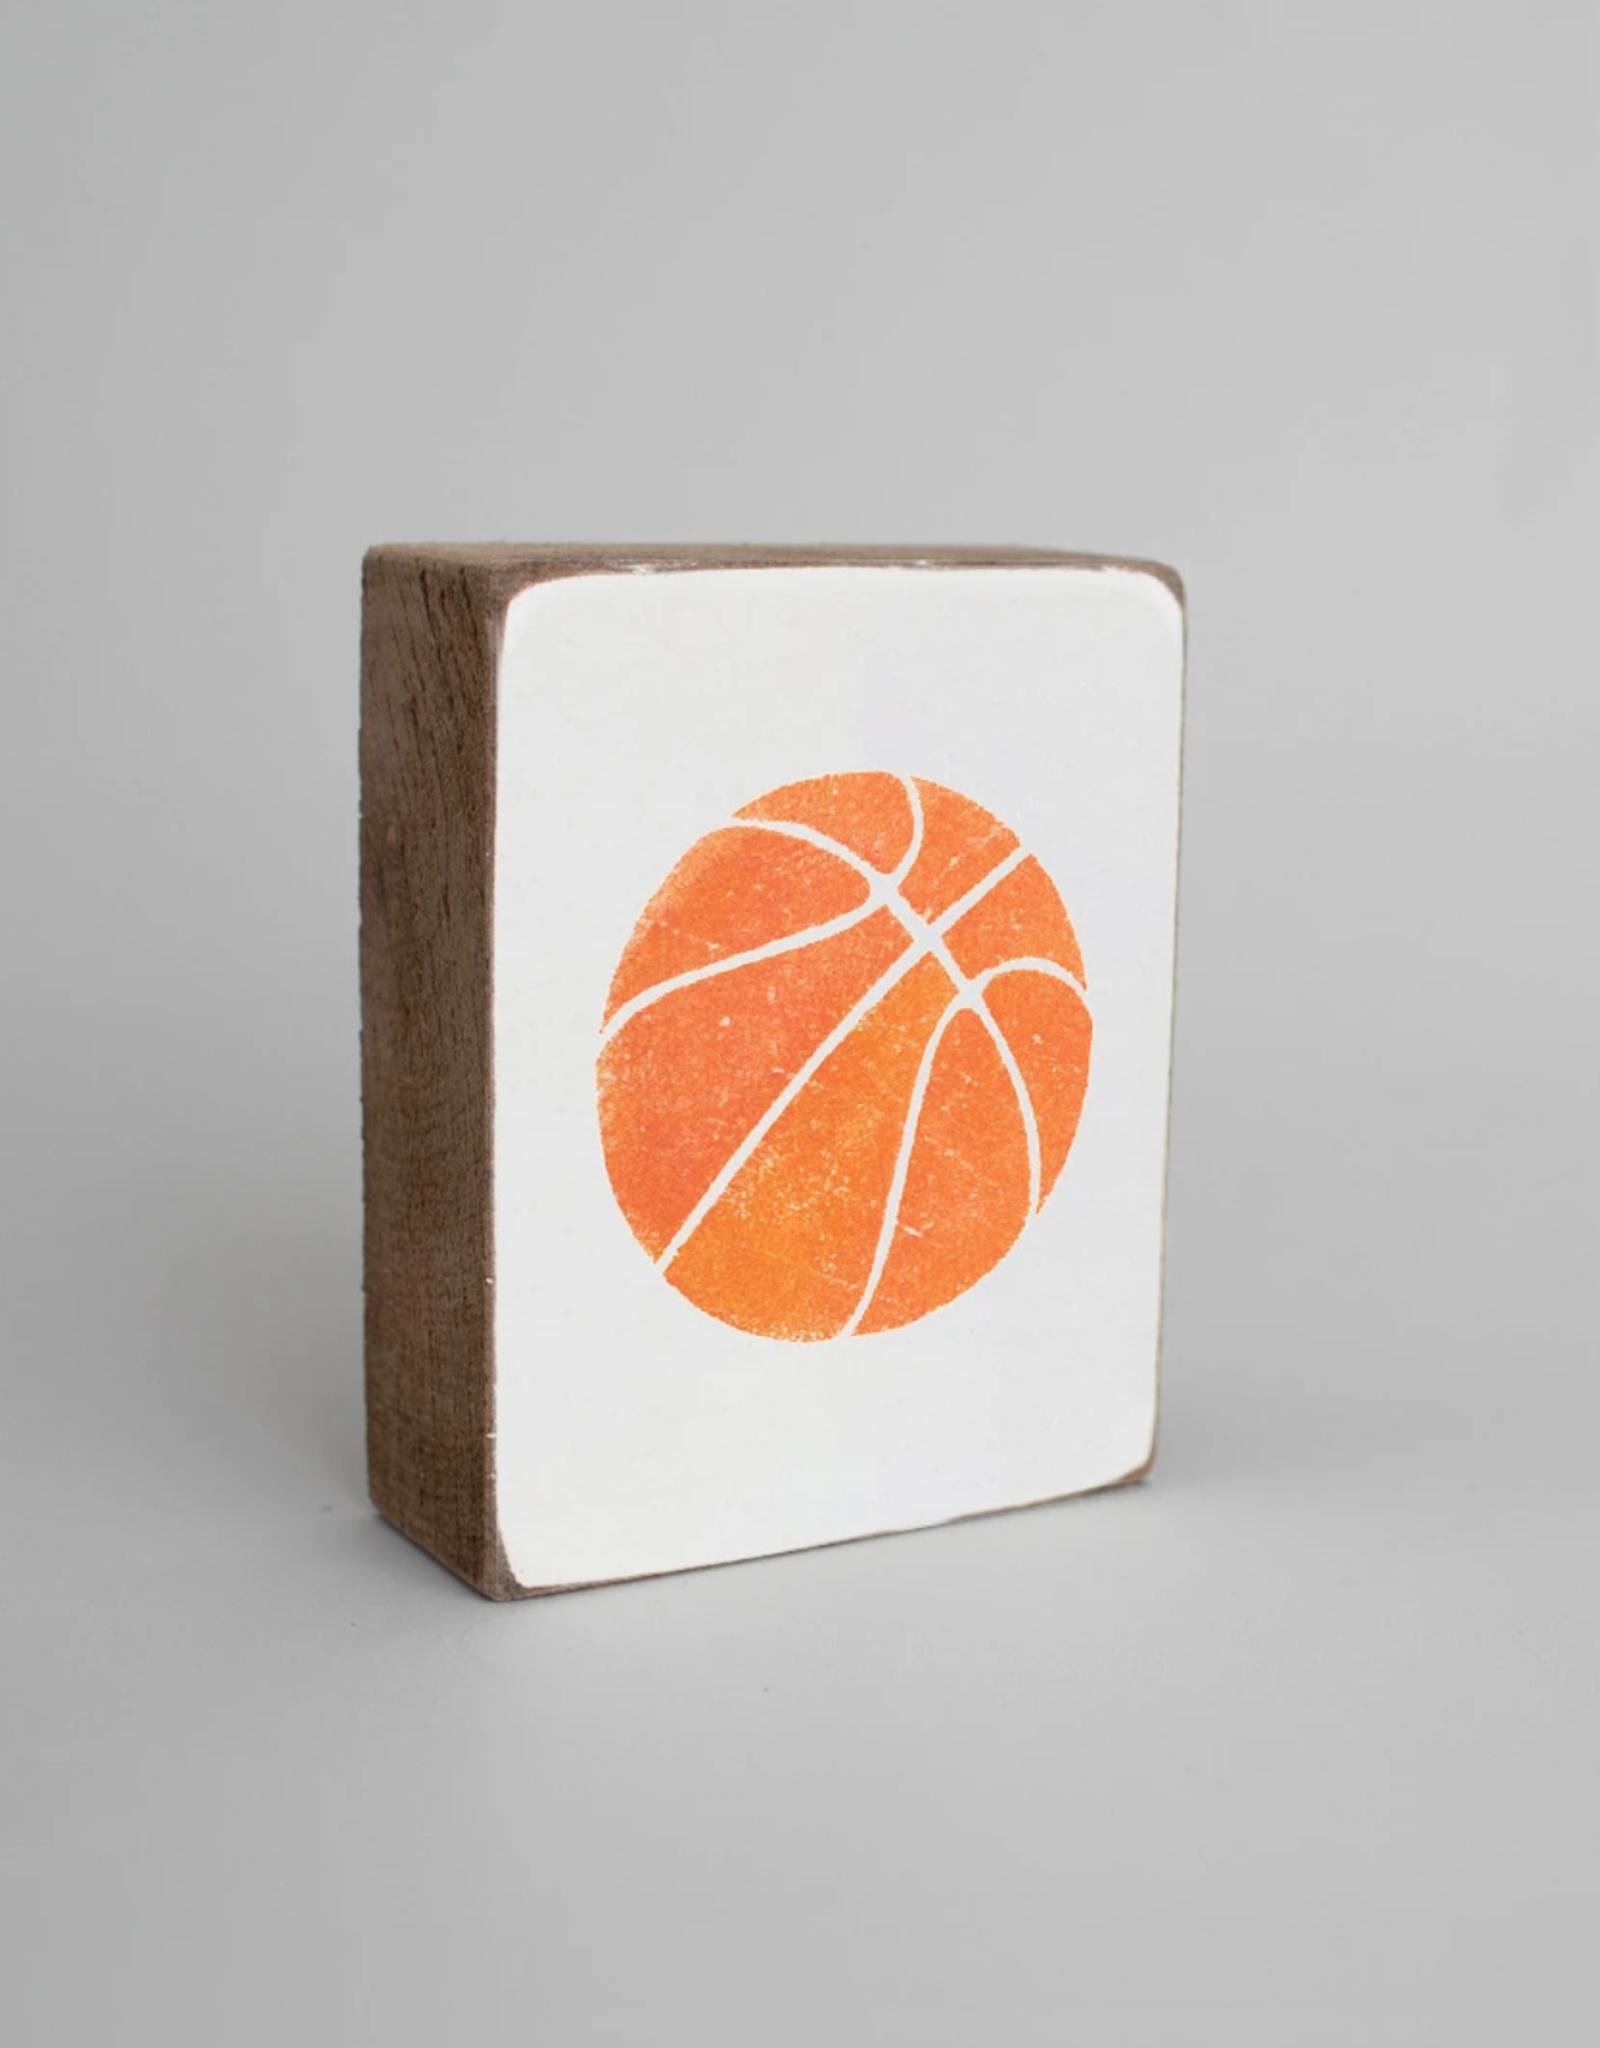 Rustic Marlin Rustic Marlin - Wood Block Basketball